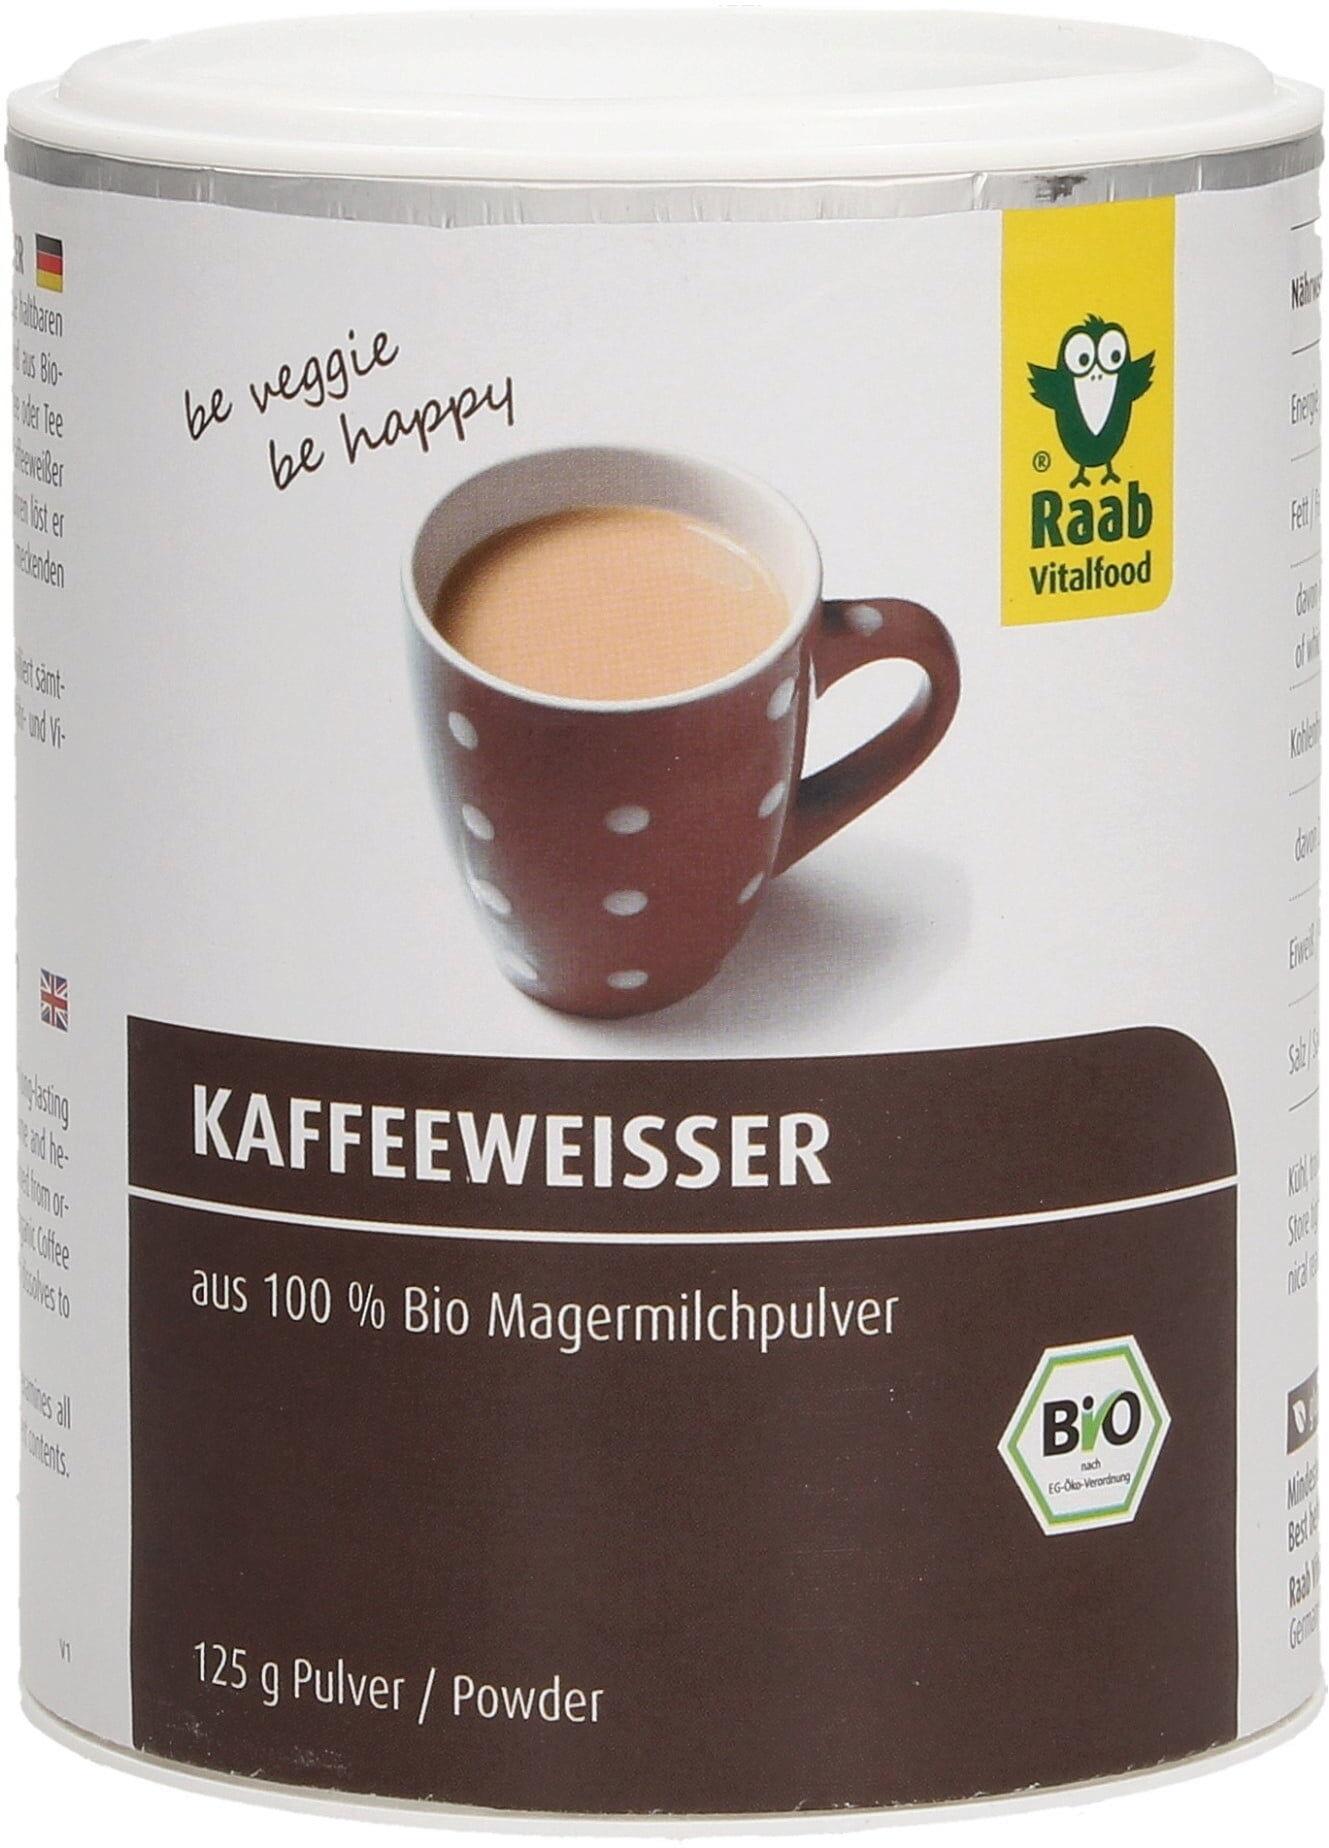 Raab Vitalfood Latte Magro Liofilizzato Biologico - 125 g